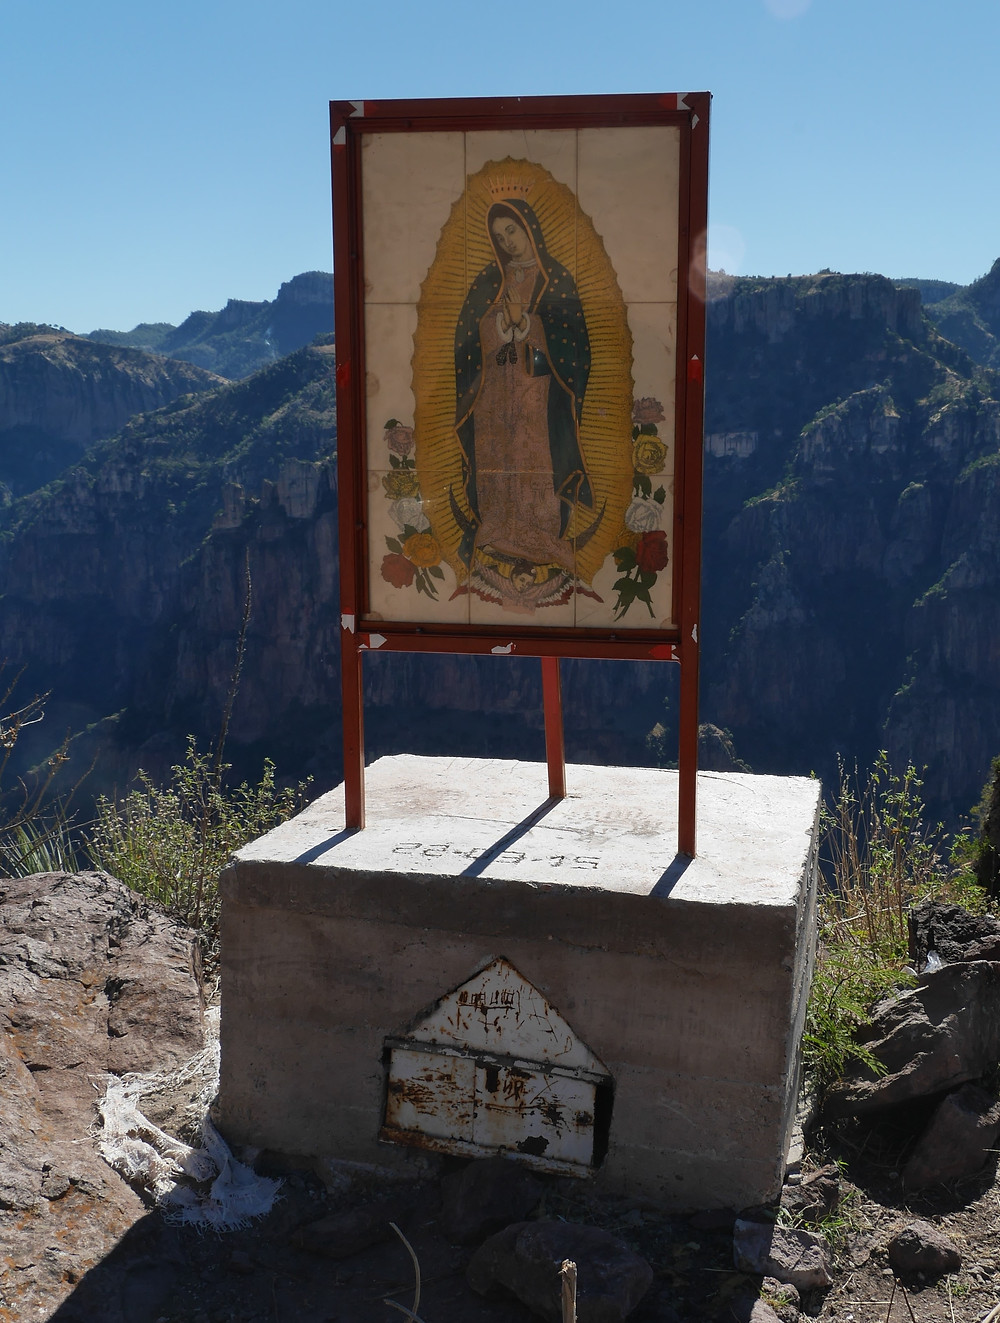 Mountain roads to Batopilas, Chihuahua, Mexico shrine